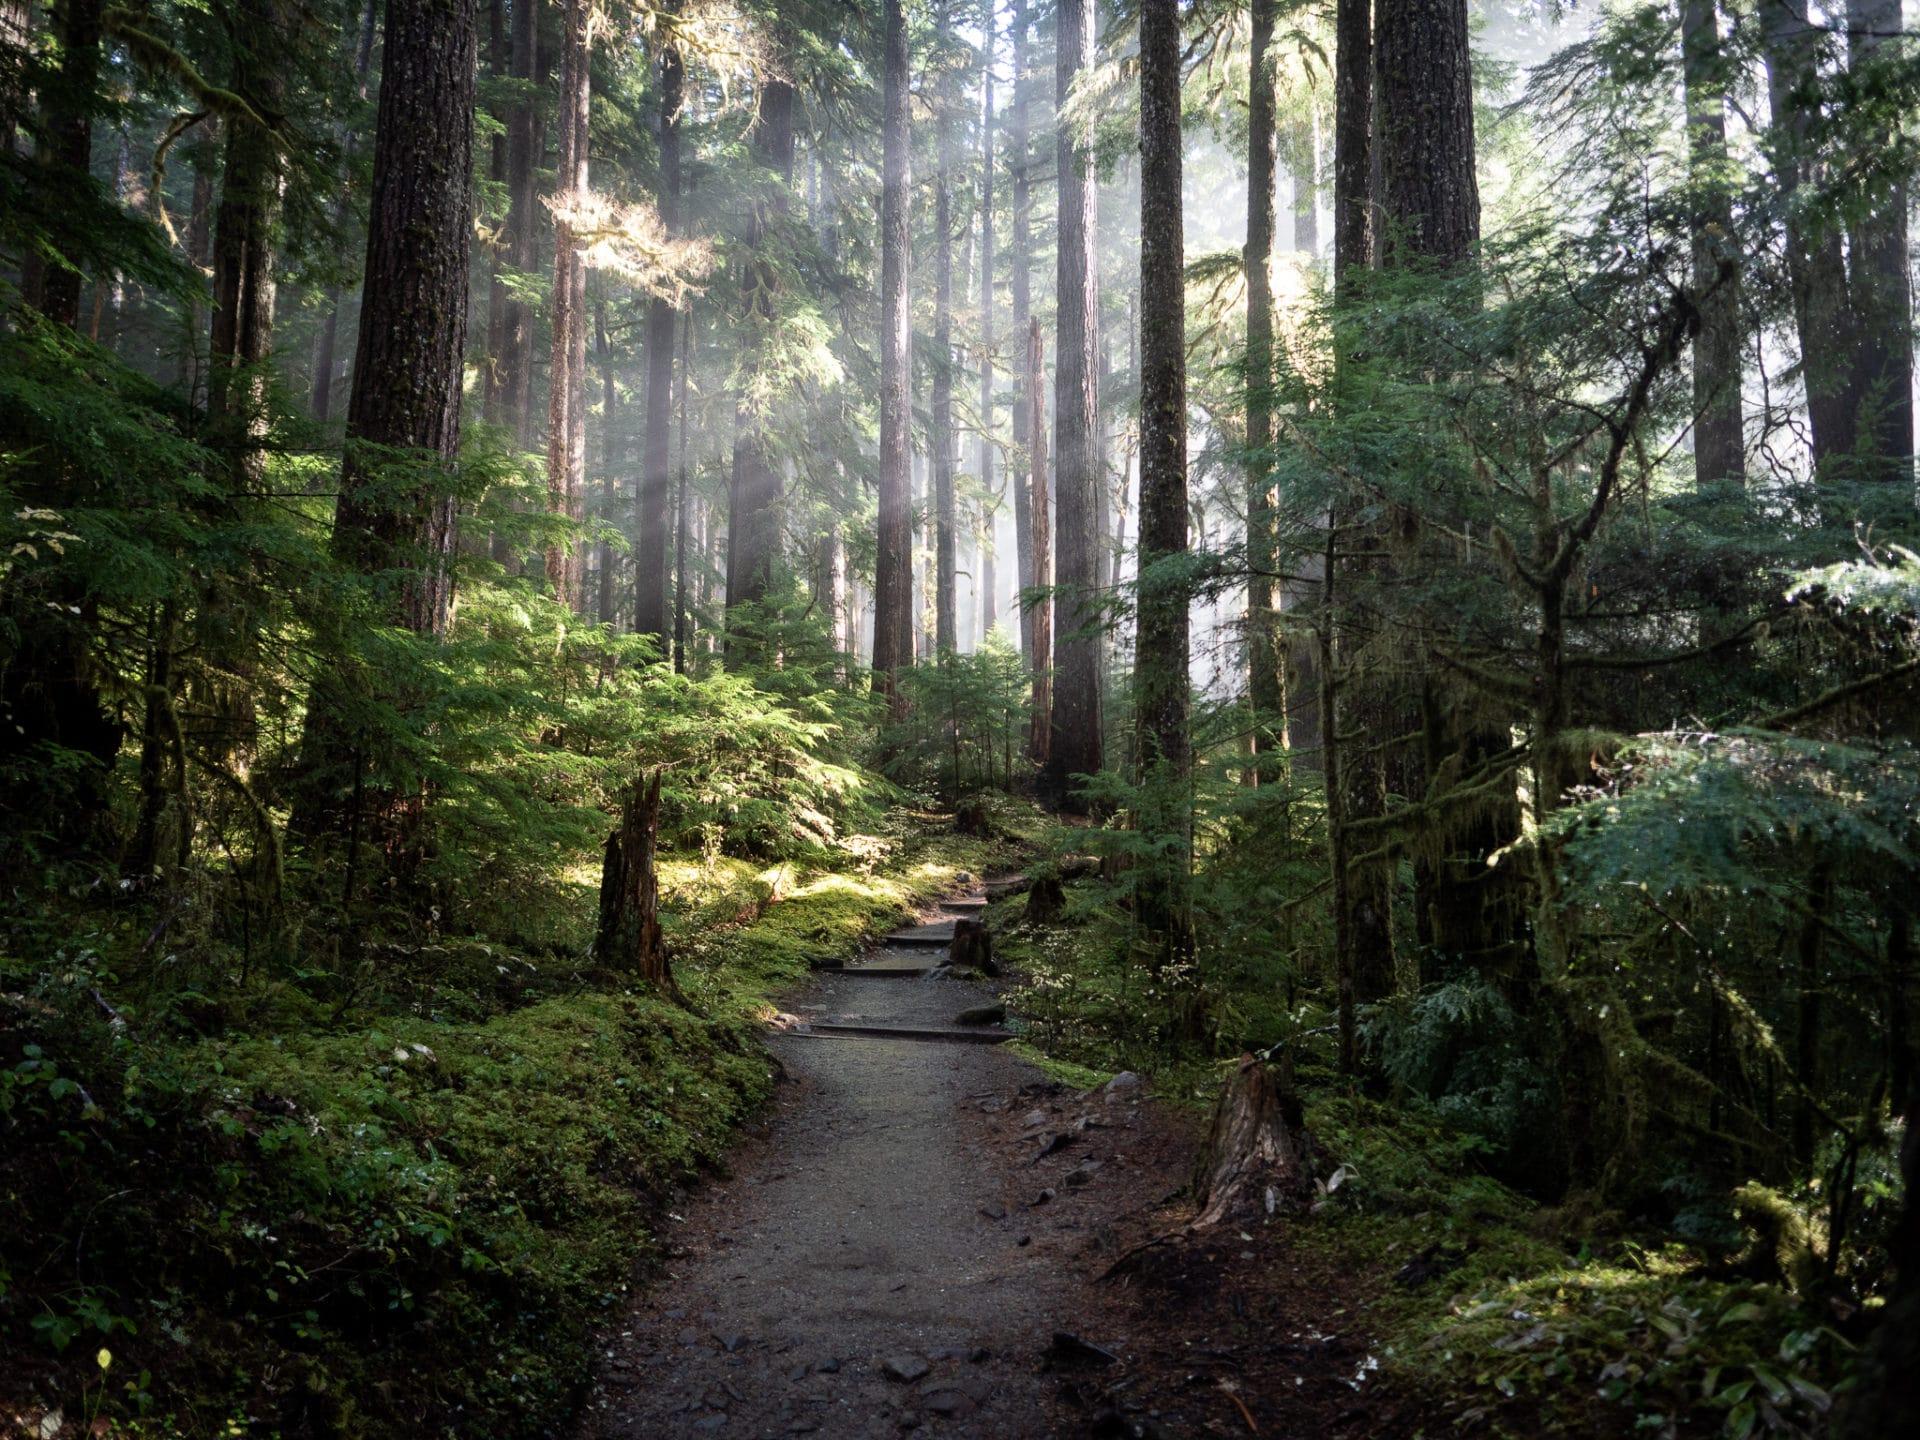 Sol-Duc-Trail-Olympic-National-Park-Sunbeam